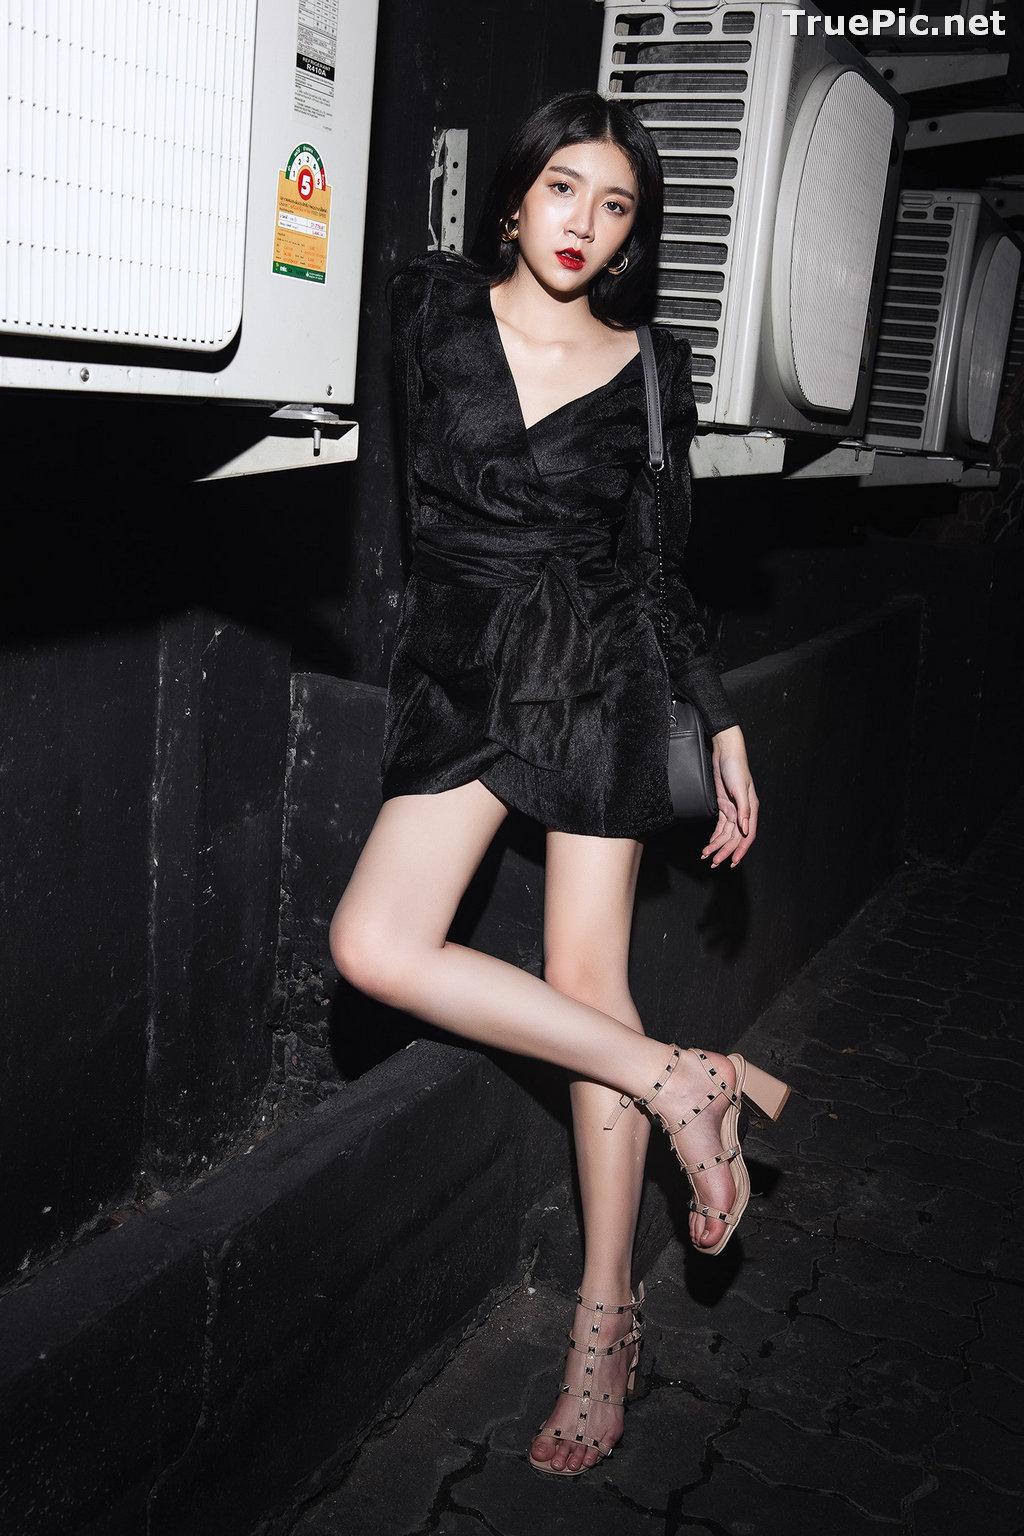 Image Thailand Model - Sasi Ngiunwan - Black For SiamNight - TruePic.net - Picture-8